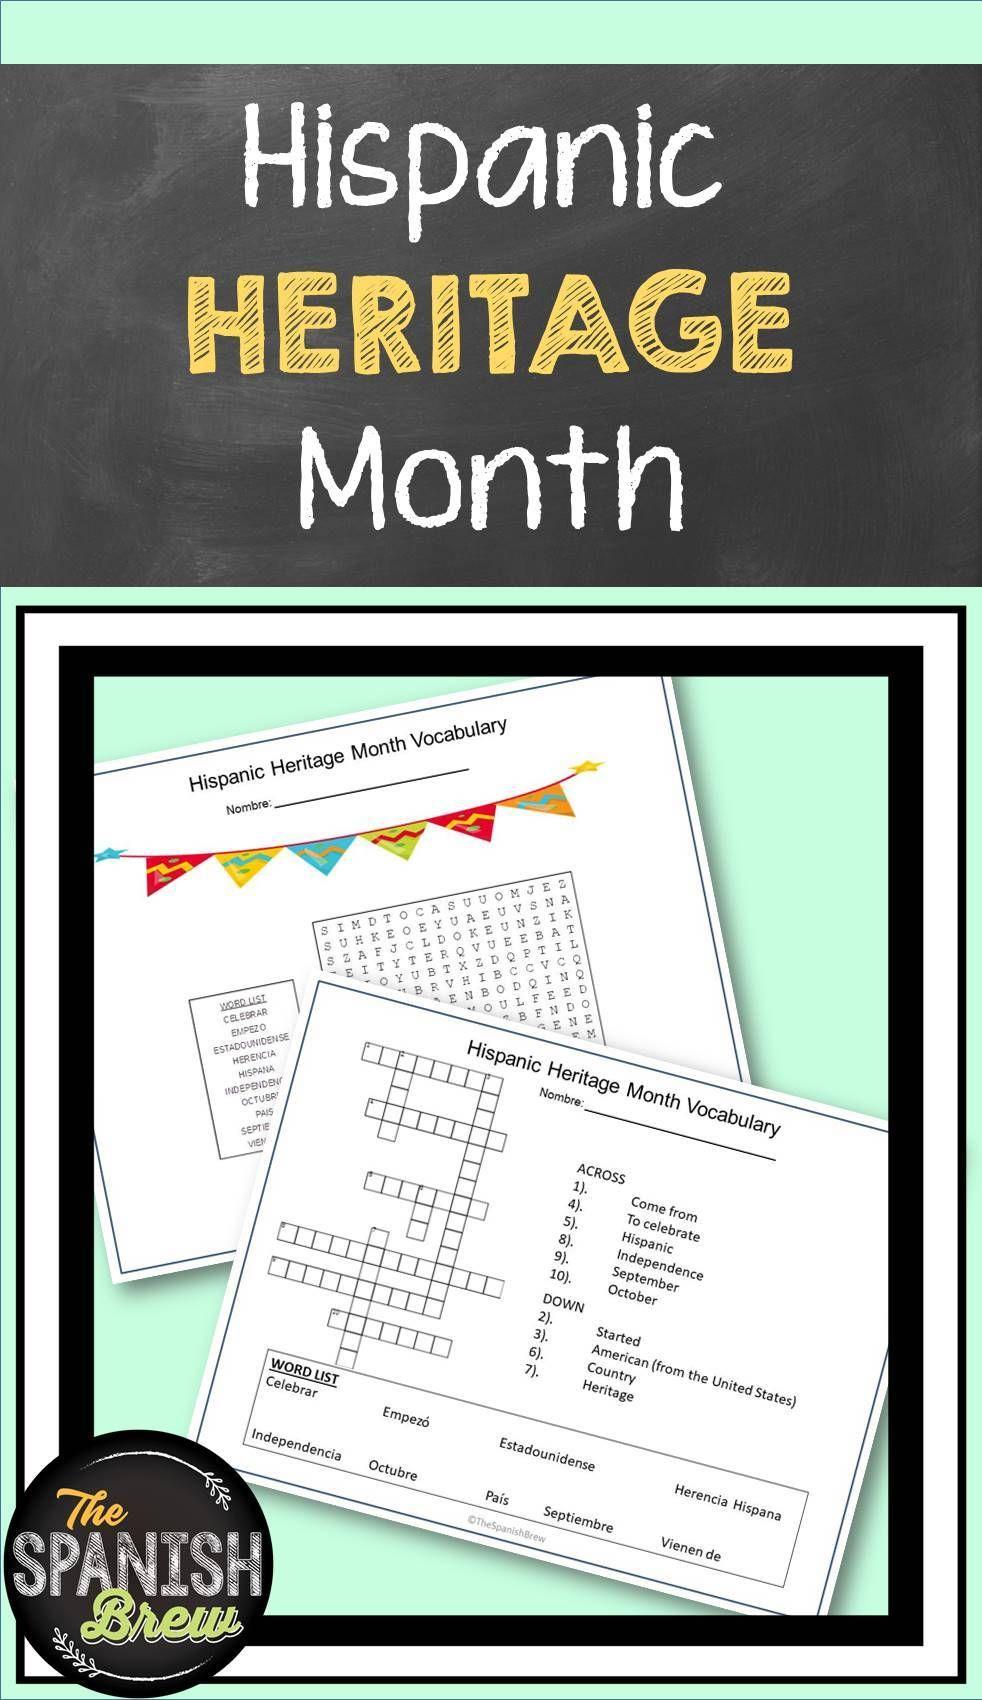 Hispanic Heritage Month Task Cards Worksheets Assessments Spanish Students Hispanic Heritage Month Heritage Month [ 1700 x 982 Pixel ]